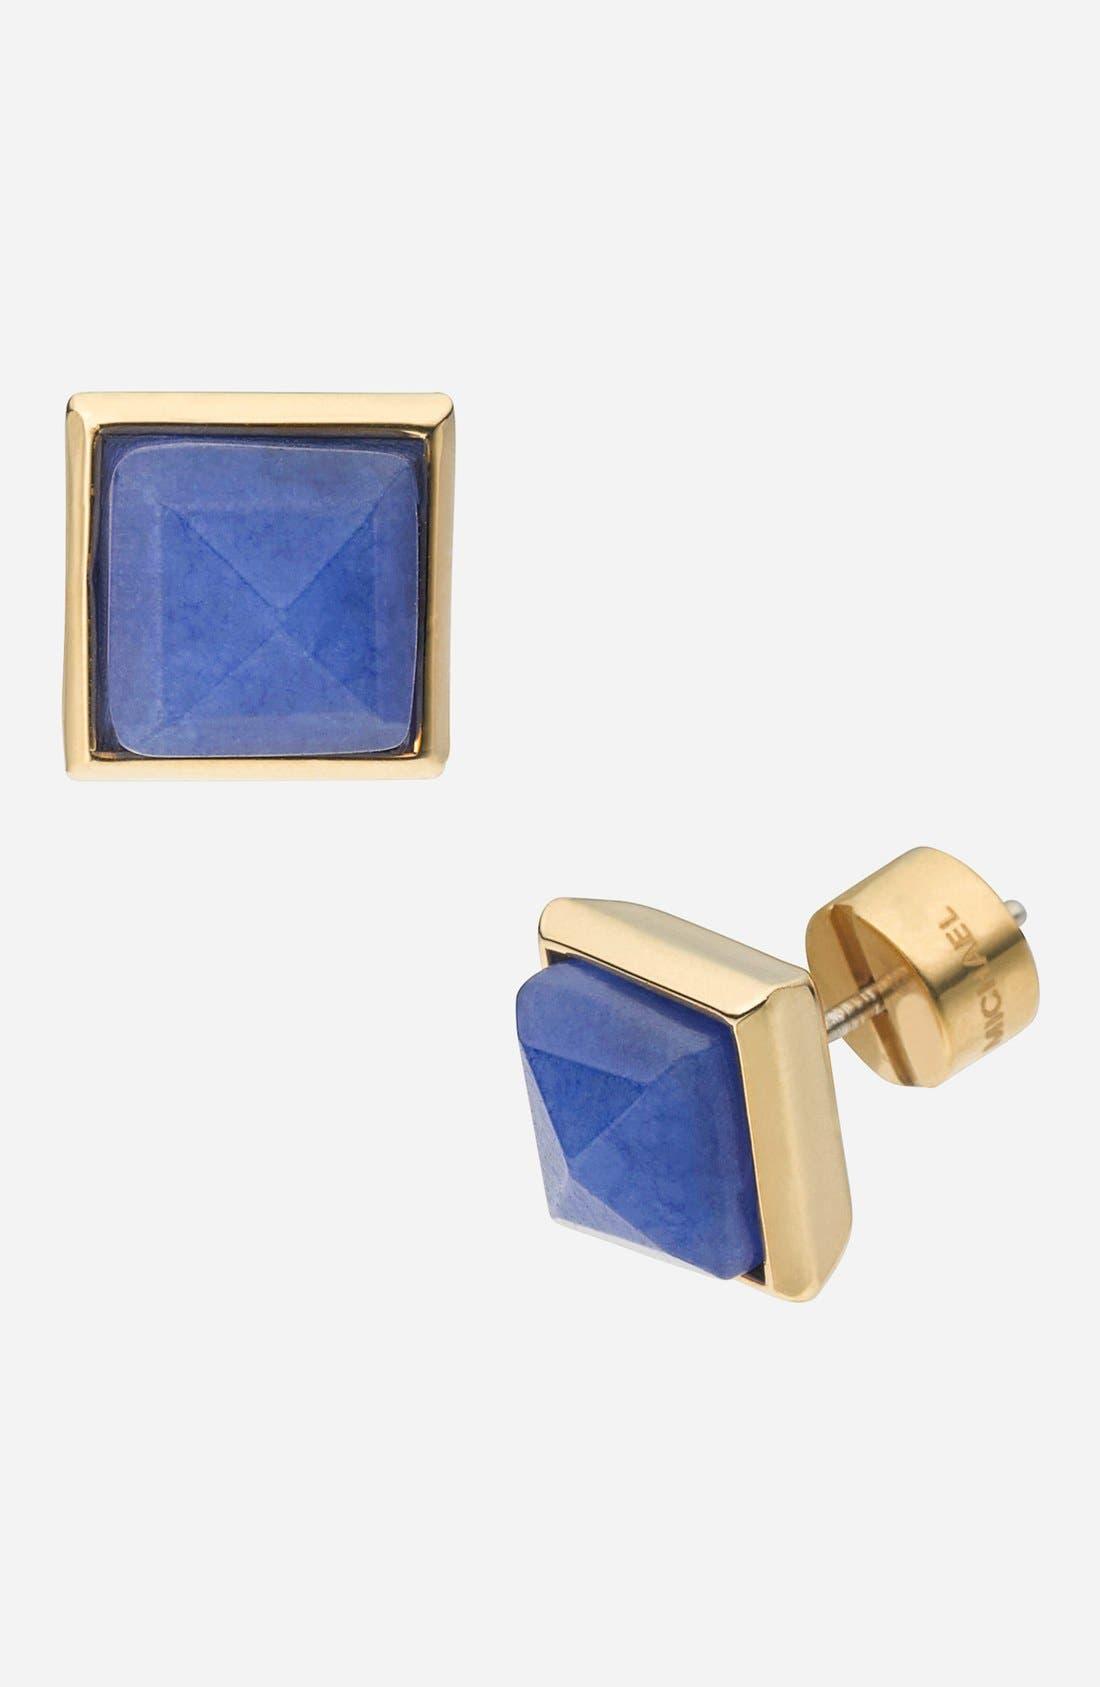 Main Image - Michael Kors 'Glam Rock' Stone Pyramid Stud Earrings